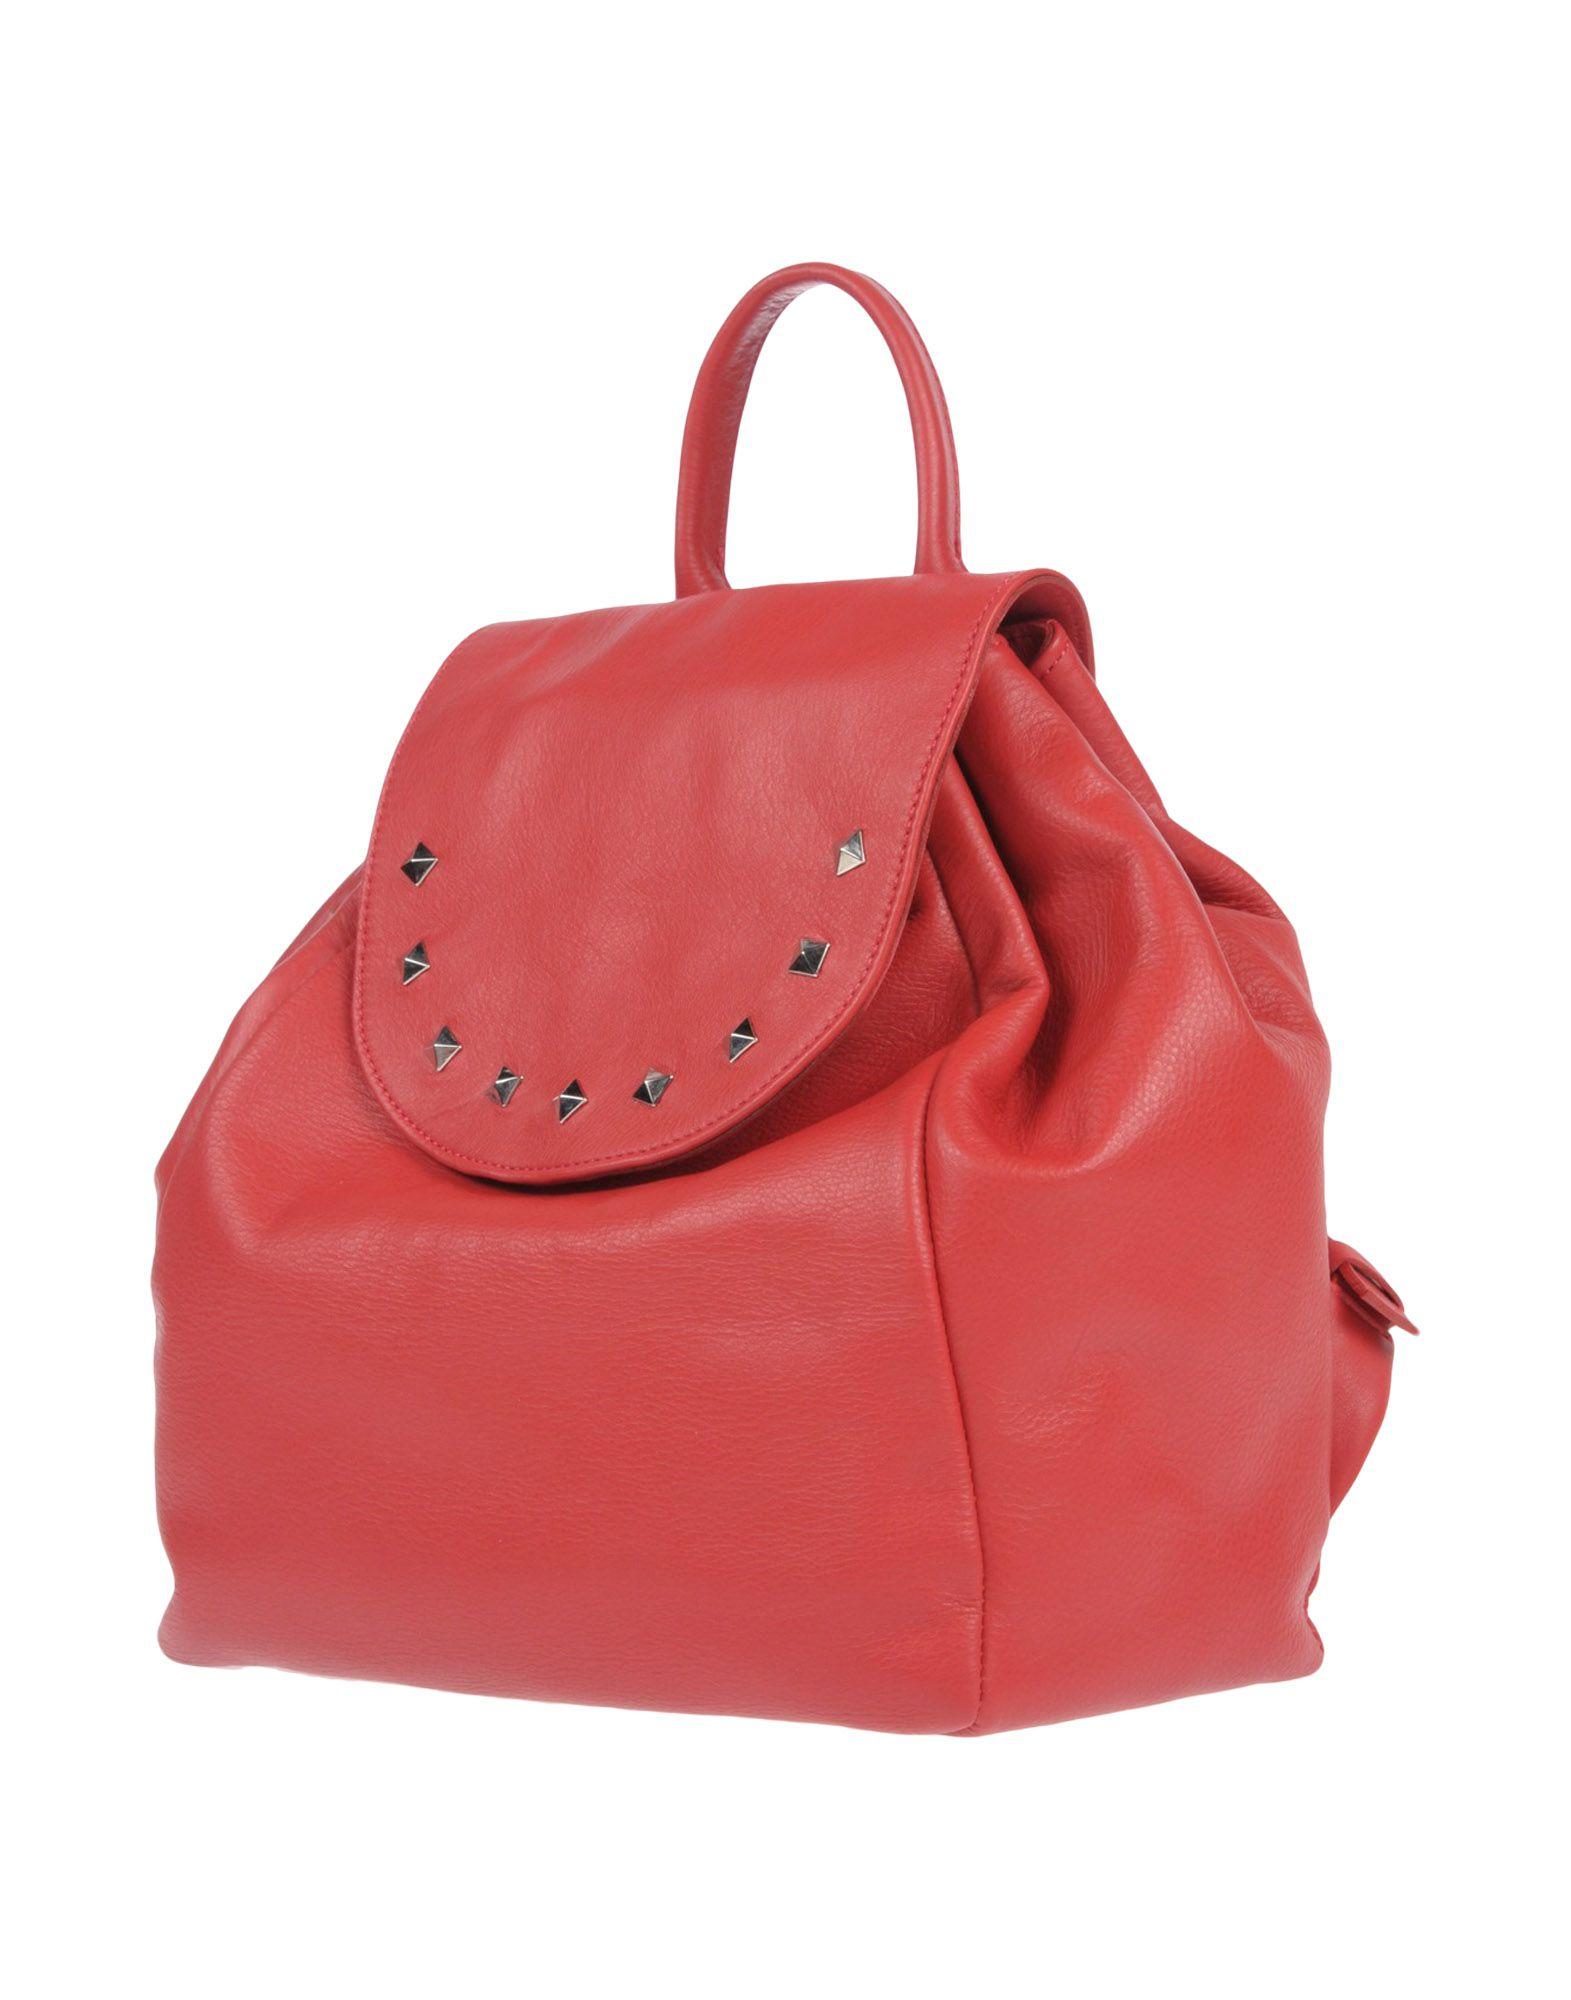 STELE Рюкзаки и сумки на пояс горячие корейской леди женщины хобо кожа pu посланника плеча сумки totes кошелек